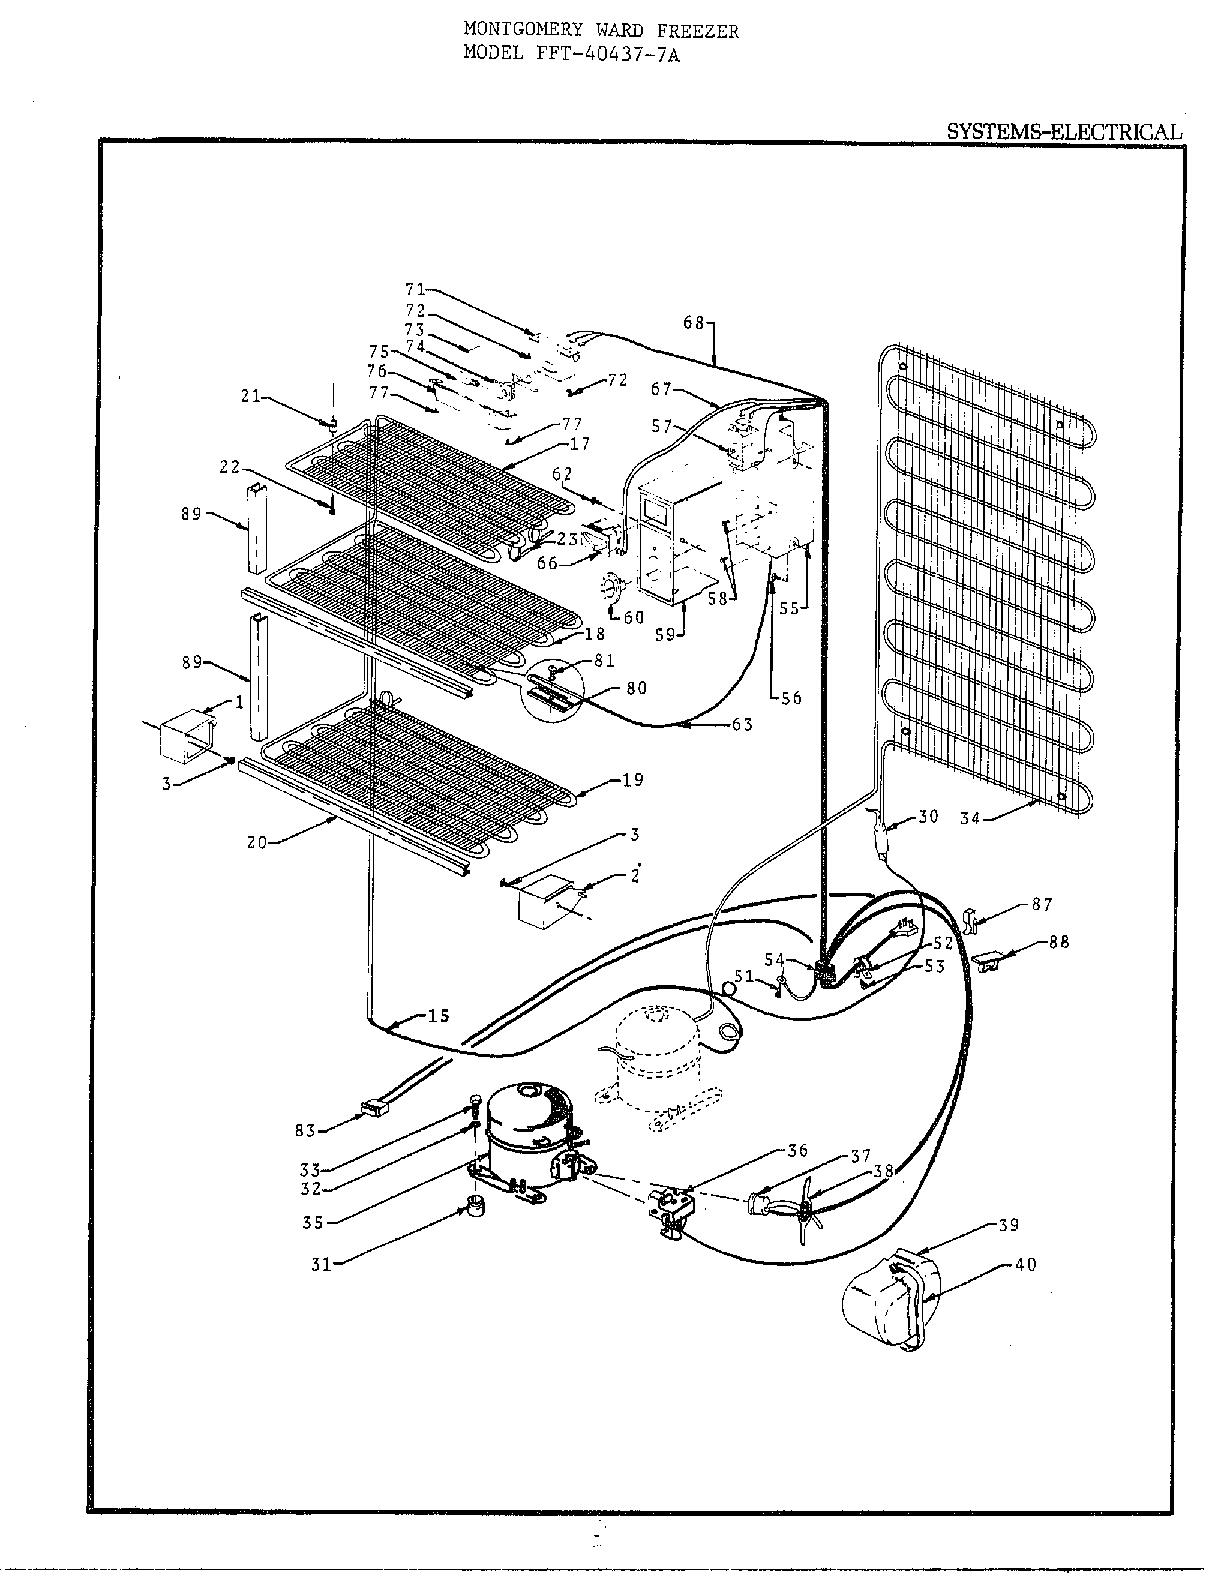 Frigidaire  Freezer  Electrical